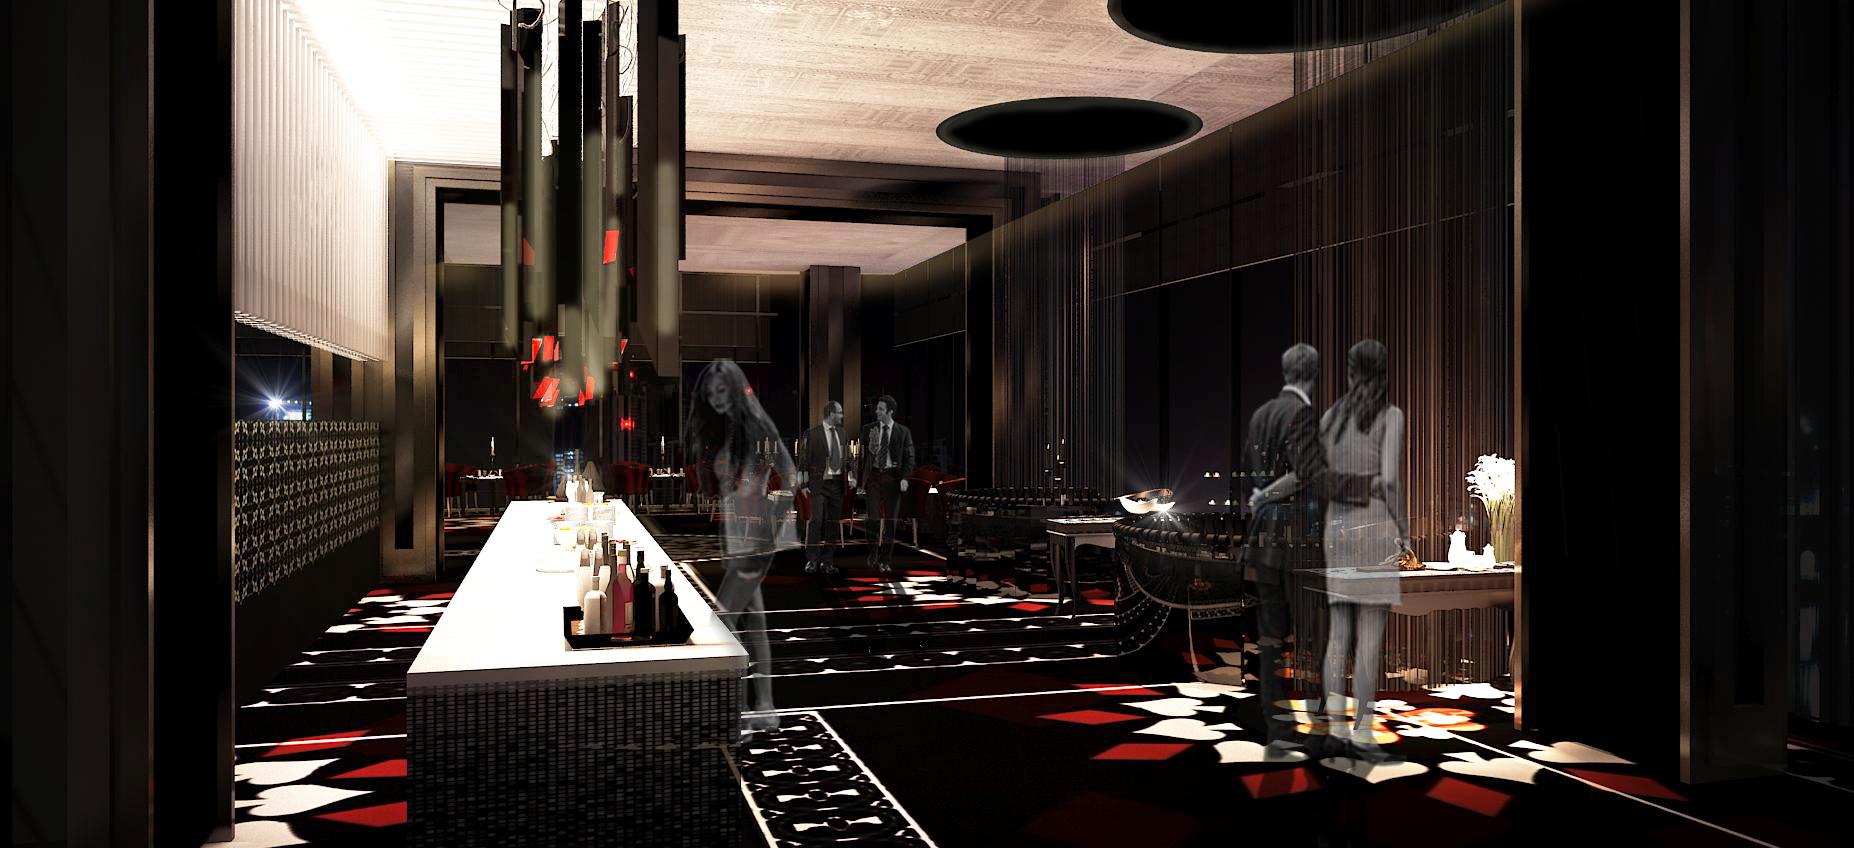 TBT-DAF interior design 42 43 super penthouse column tower bangkok thailand 10.j